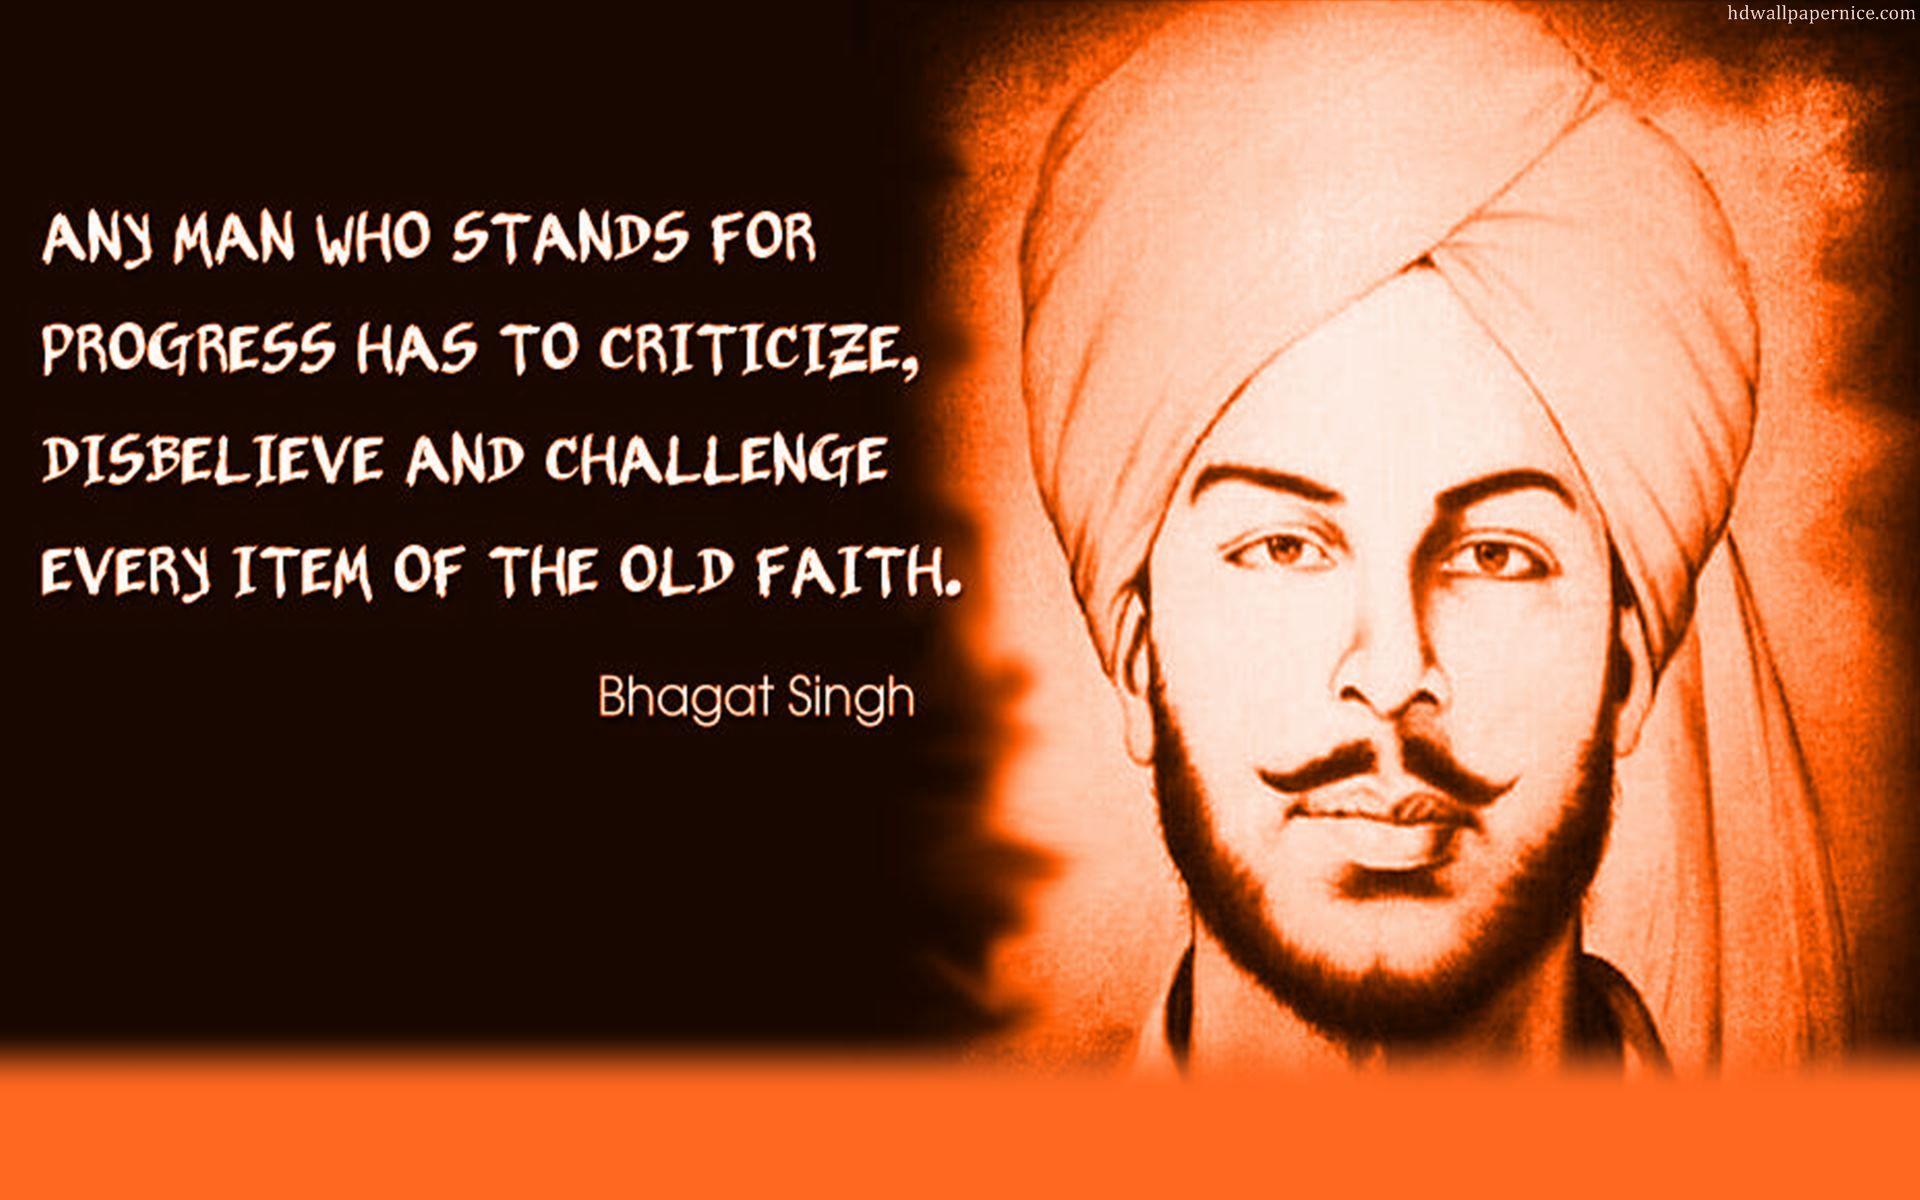 Bhagat Singh Quotes Atheist - HD Wallpaper